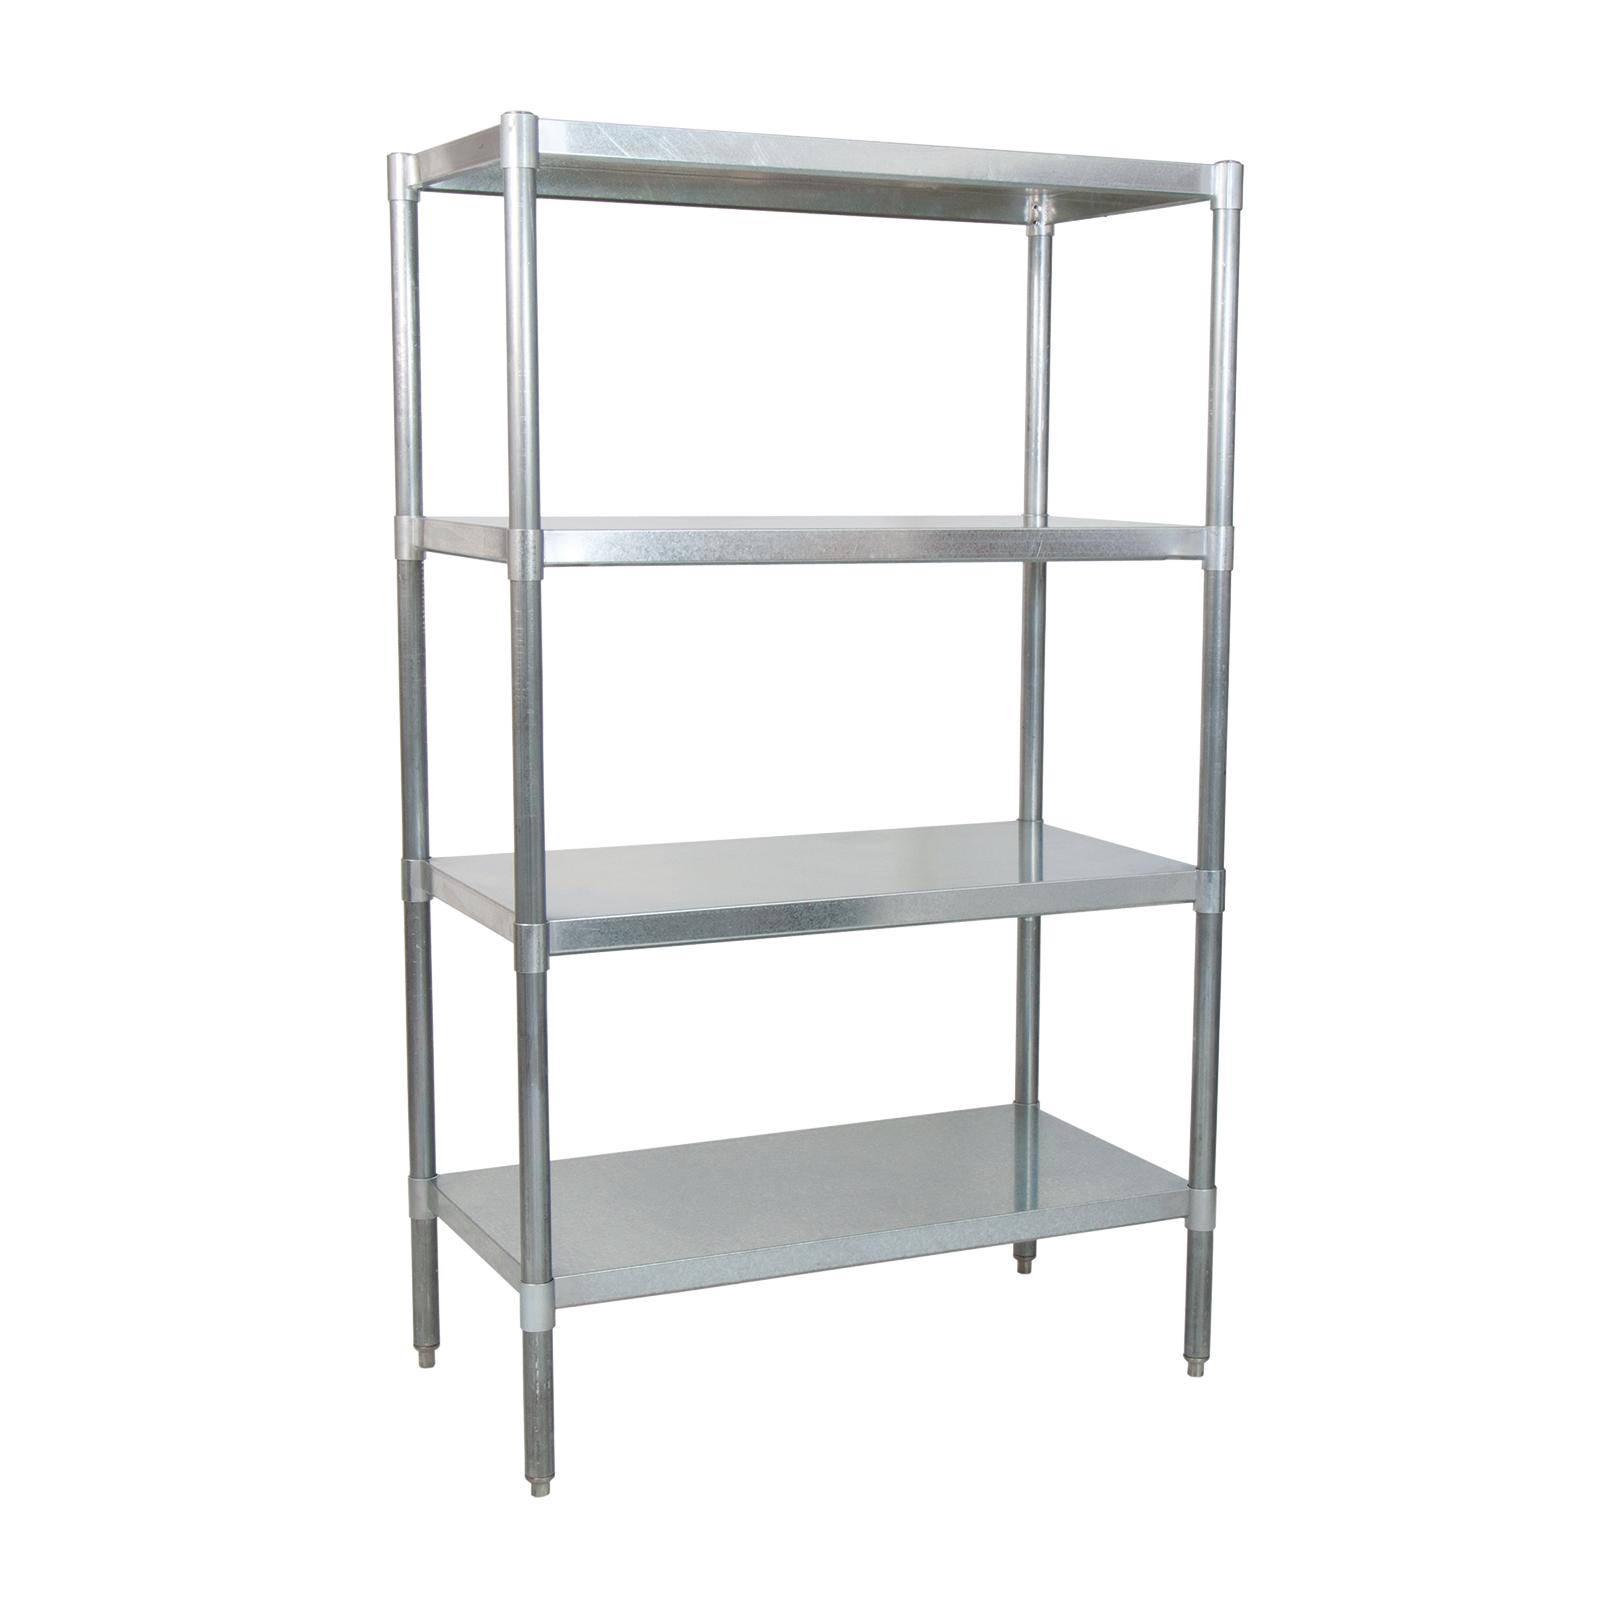 BK Resources SSU6-3124 shelving unit, solid flat